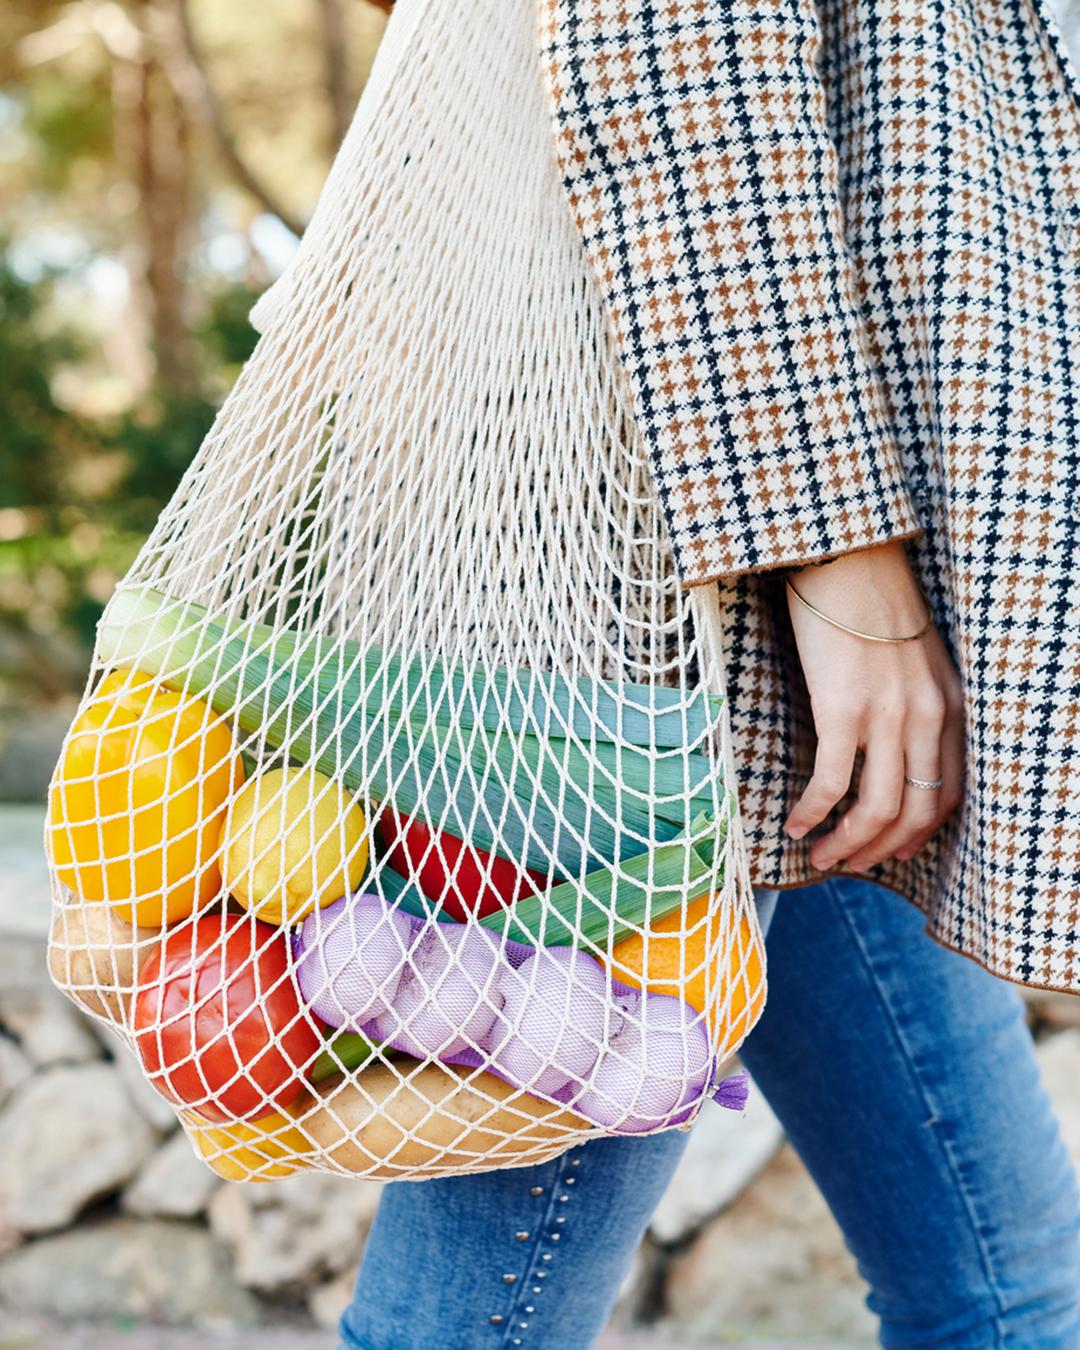 A woman walks with a reusable bag.